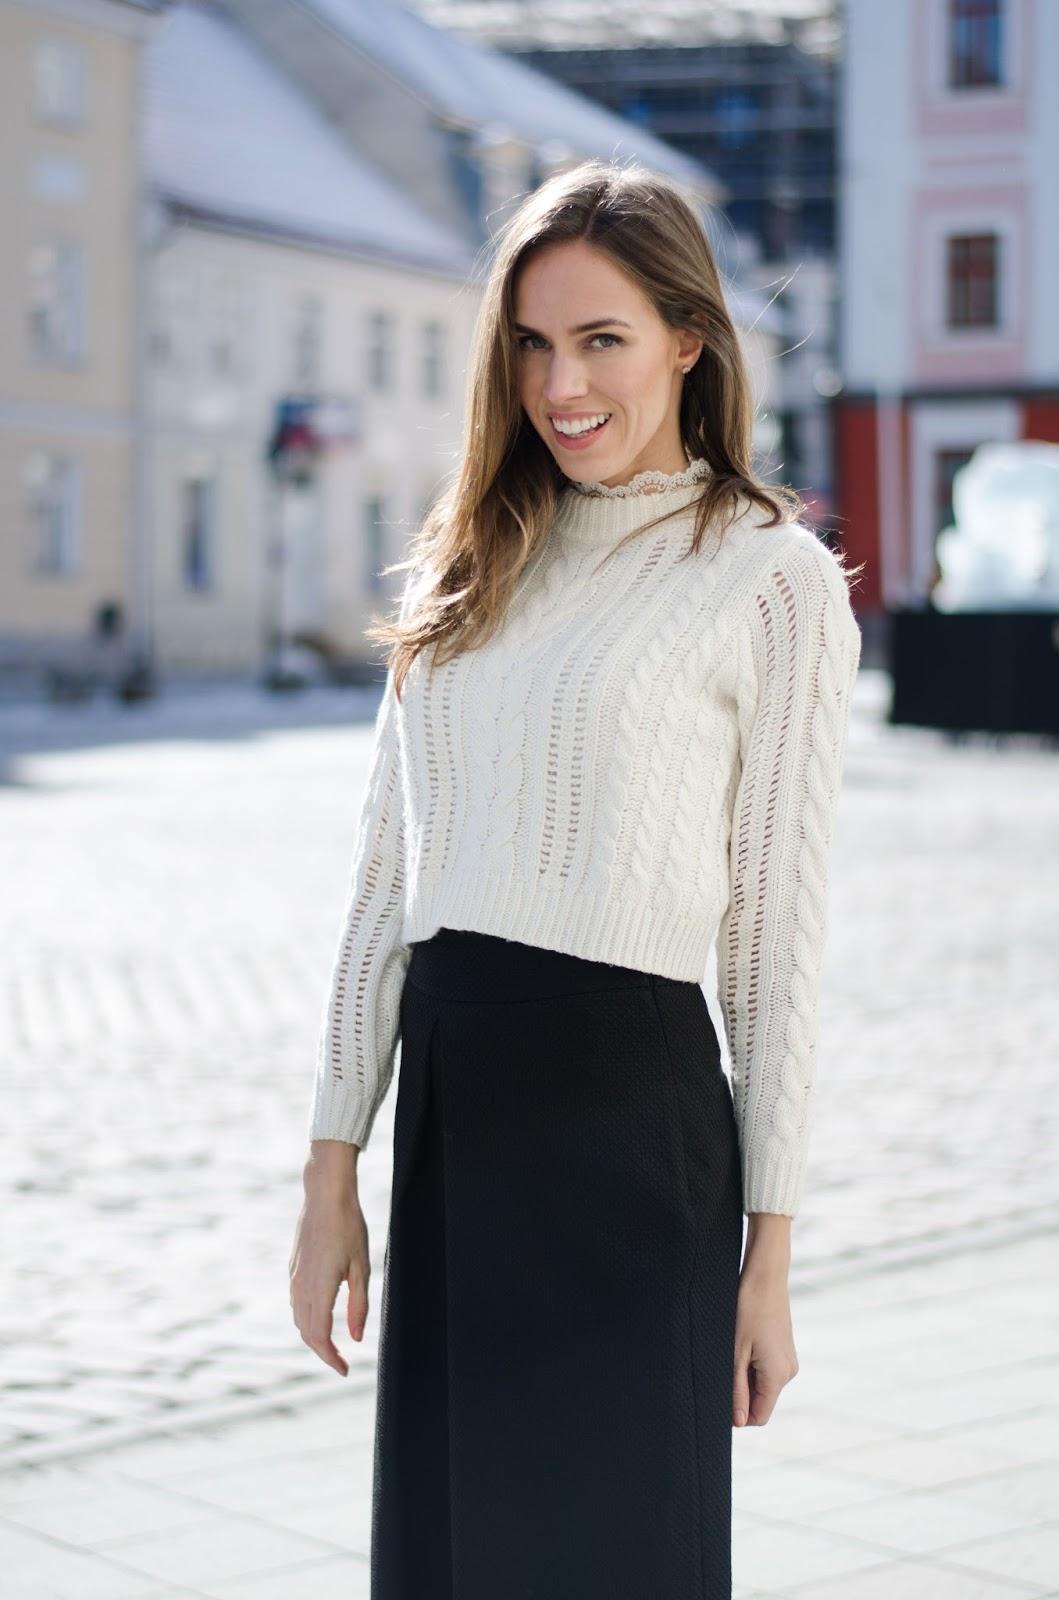 kristjaana mere white cropped sweater black trousers